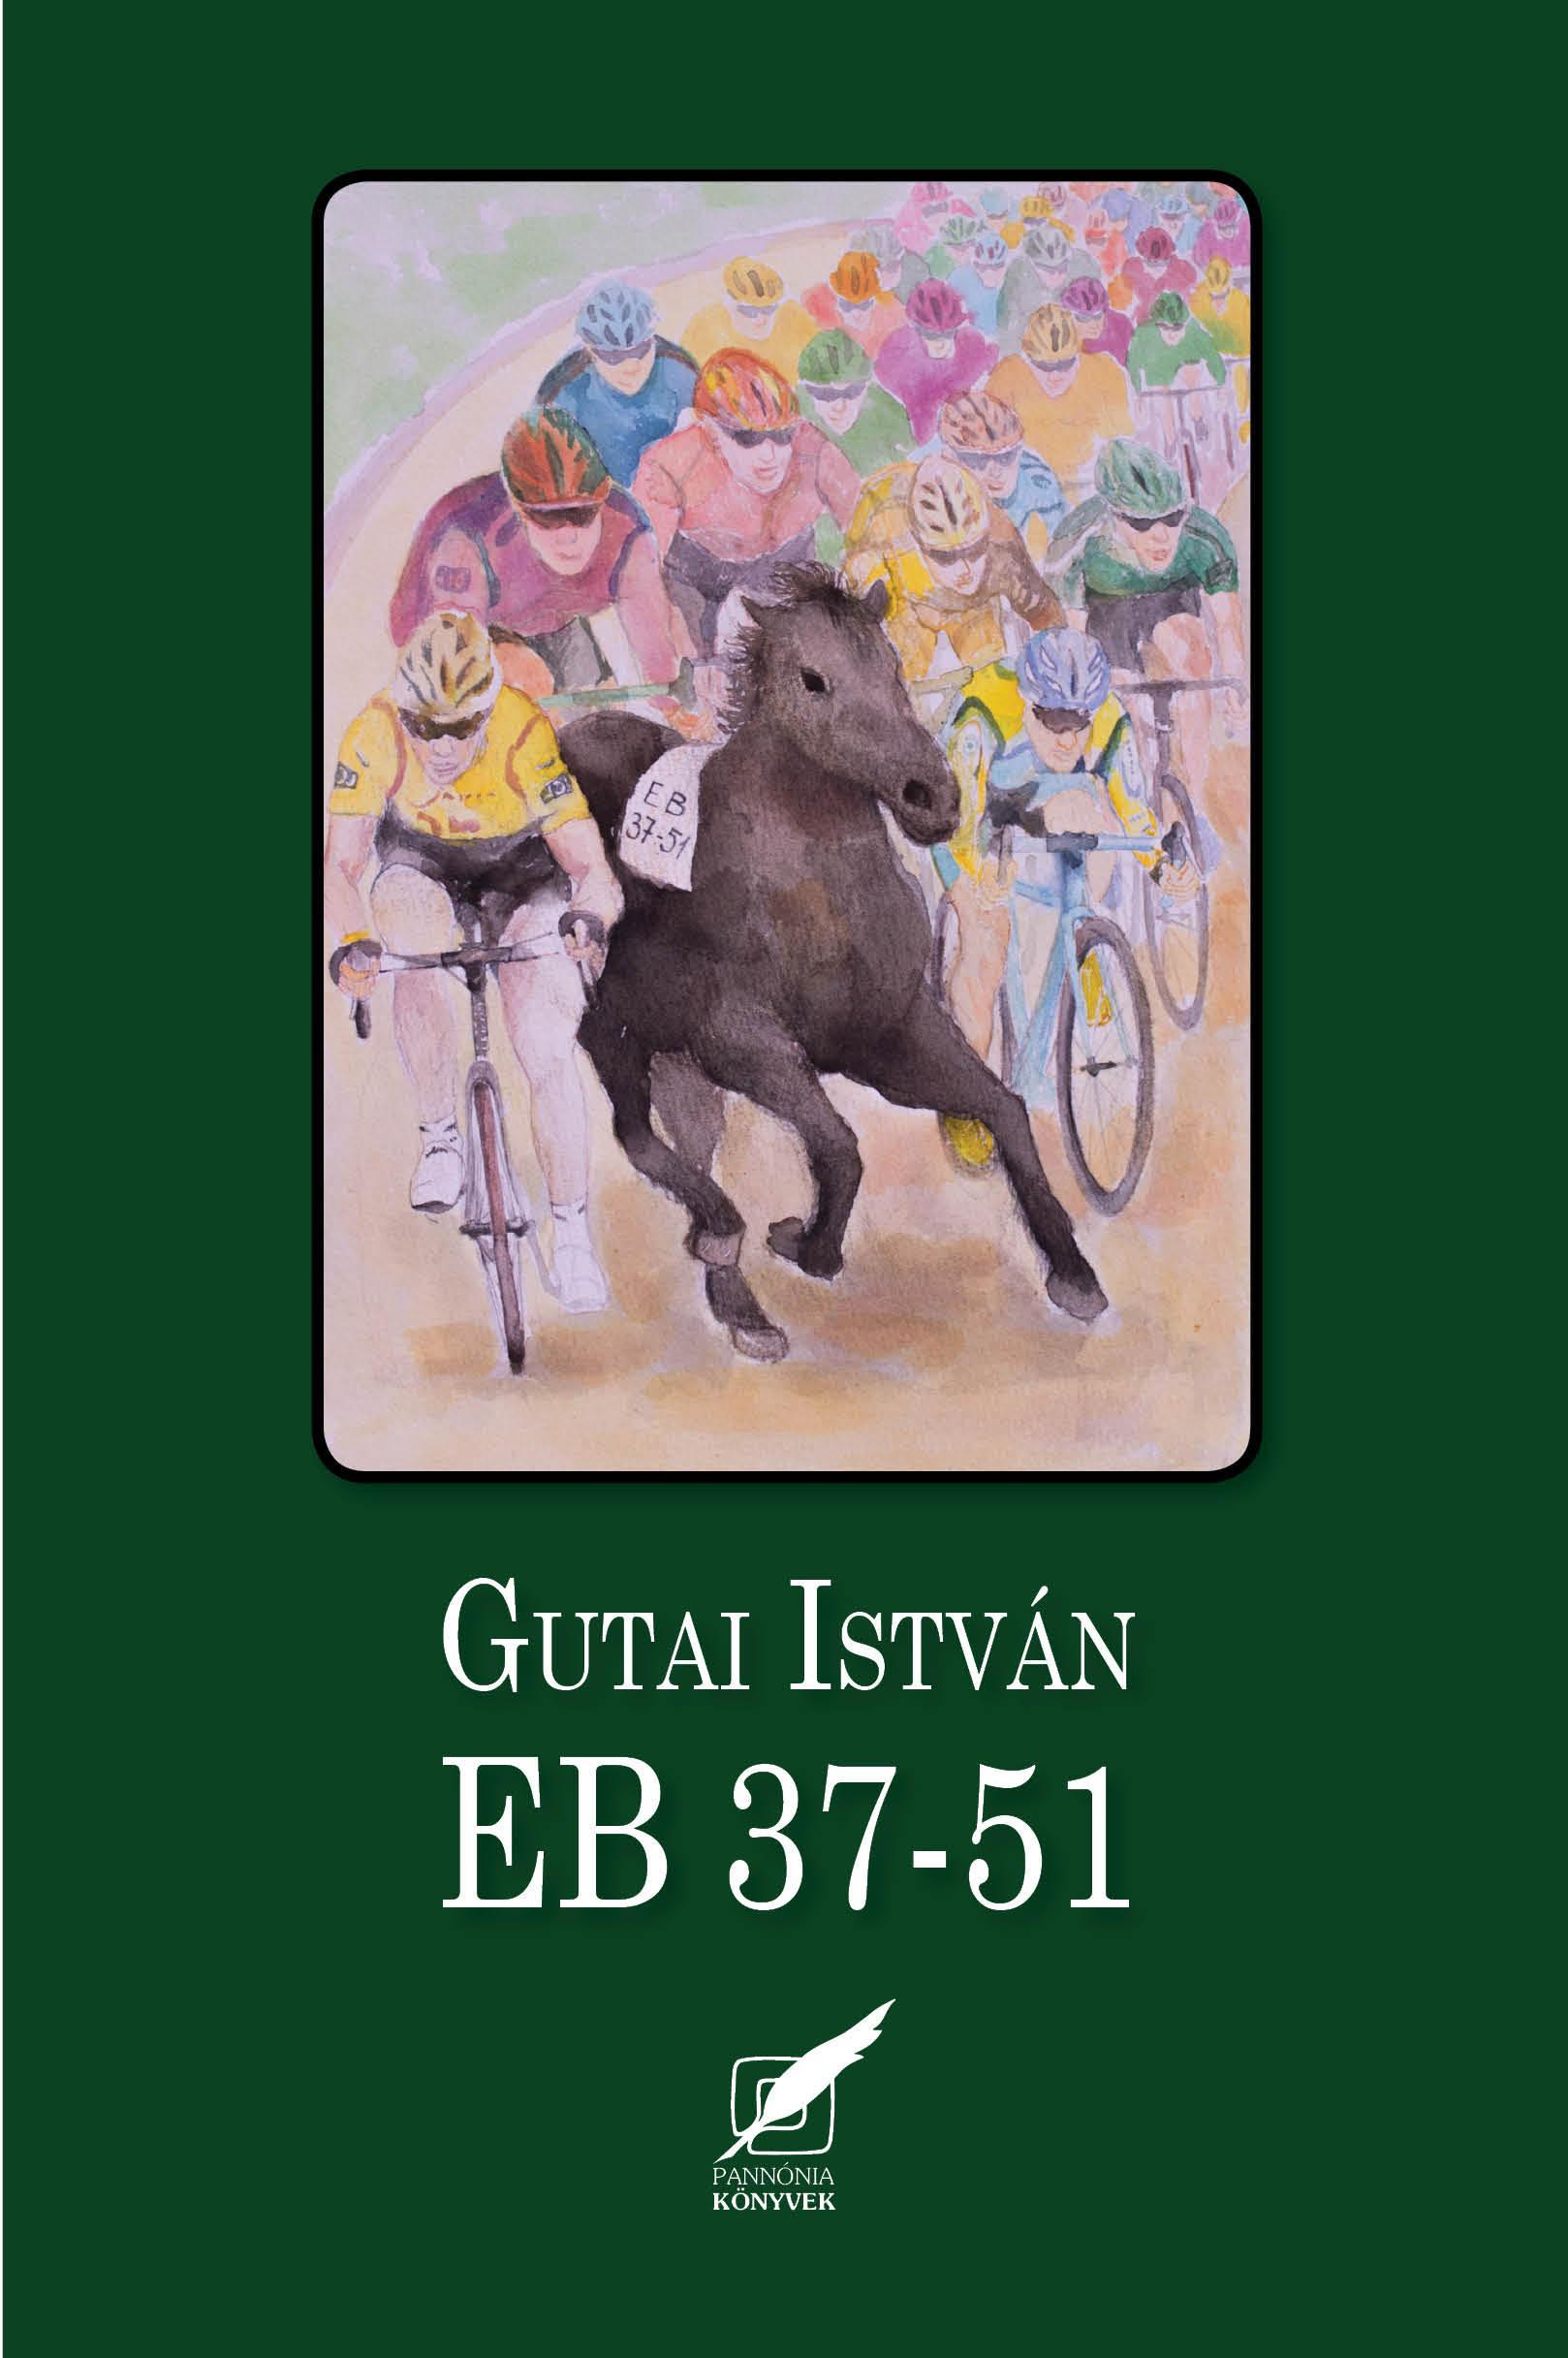 EB 37-51